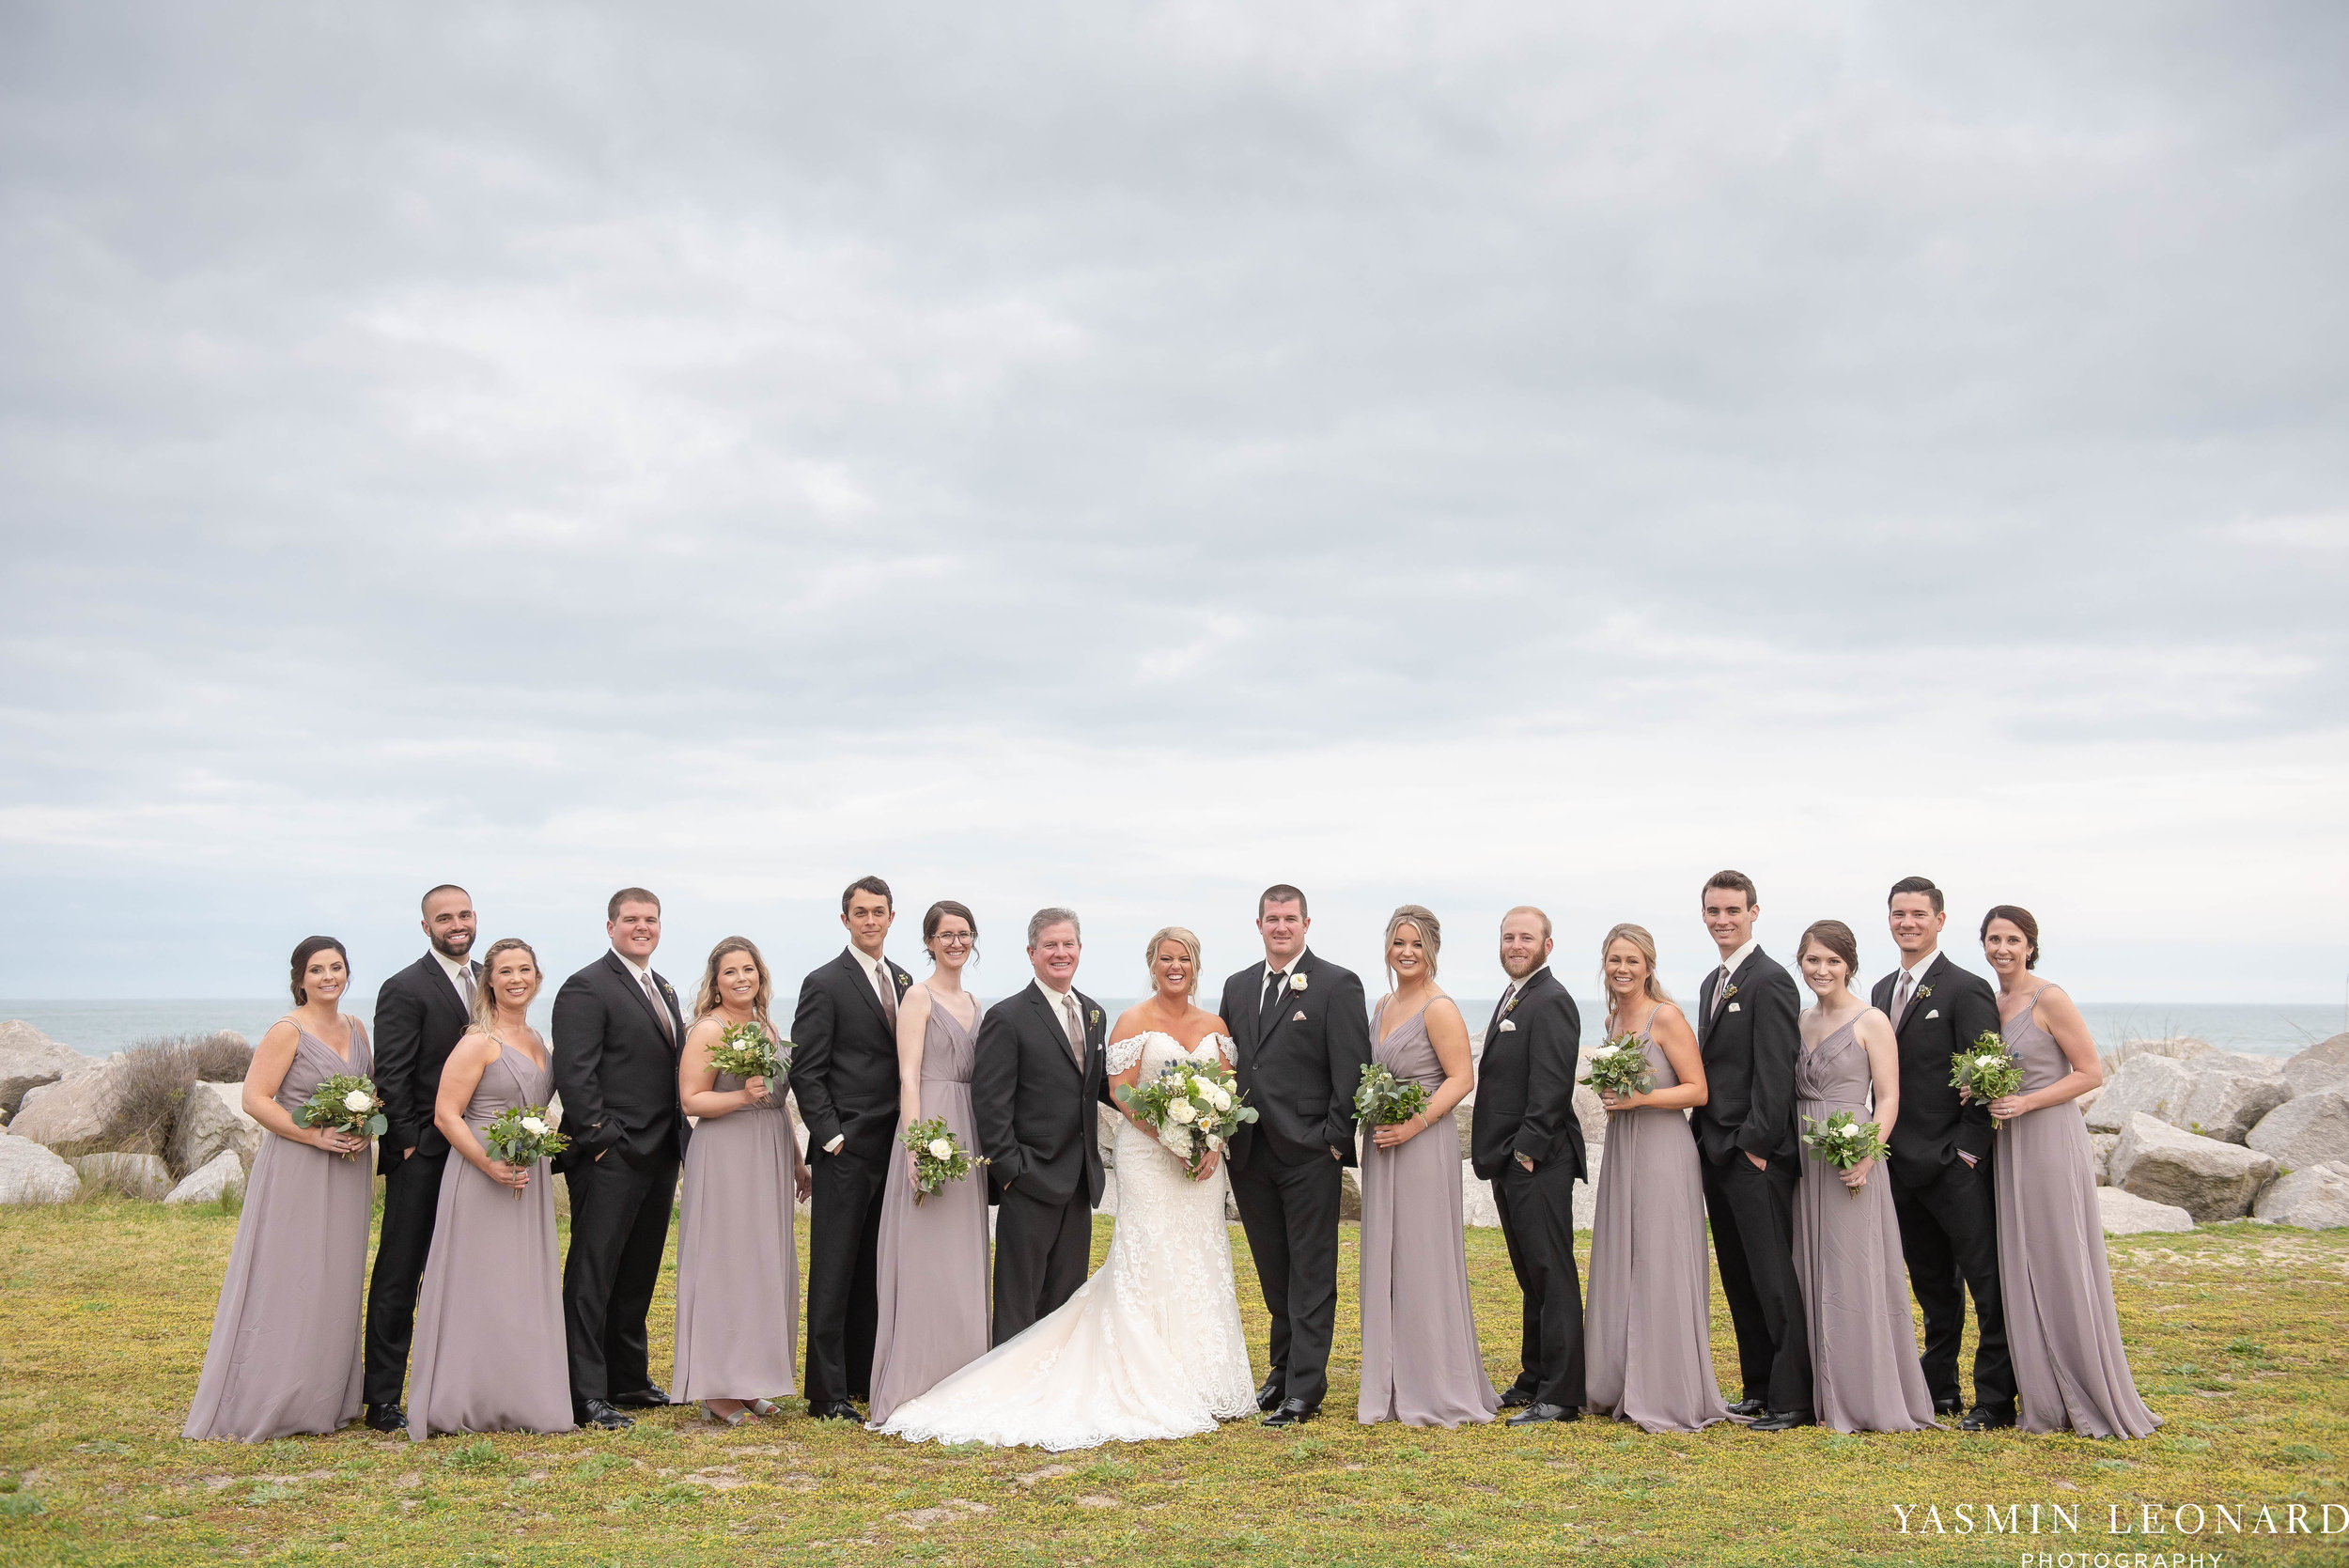 Carolina Beach Wedding - Fort Fisher Wedding - NC Acquarium - Beach Wedding - NC Wedding - Beach Wedding Inspiration - Beach Bride-26.jpg